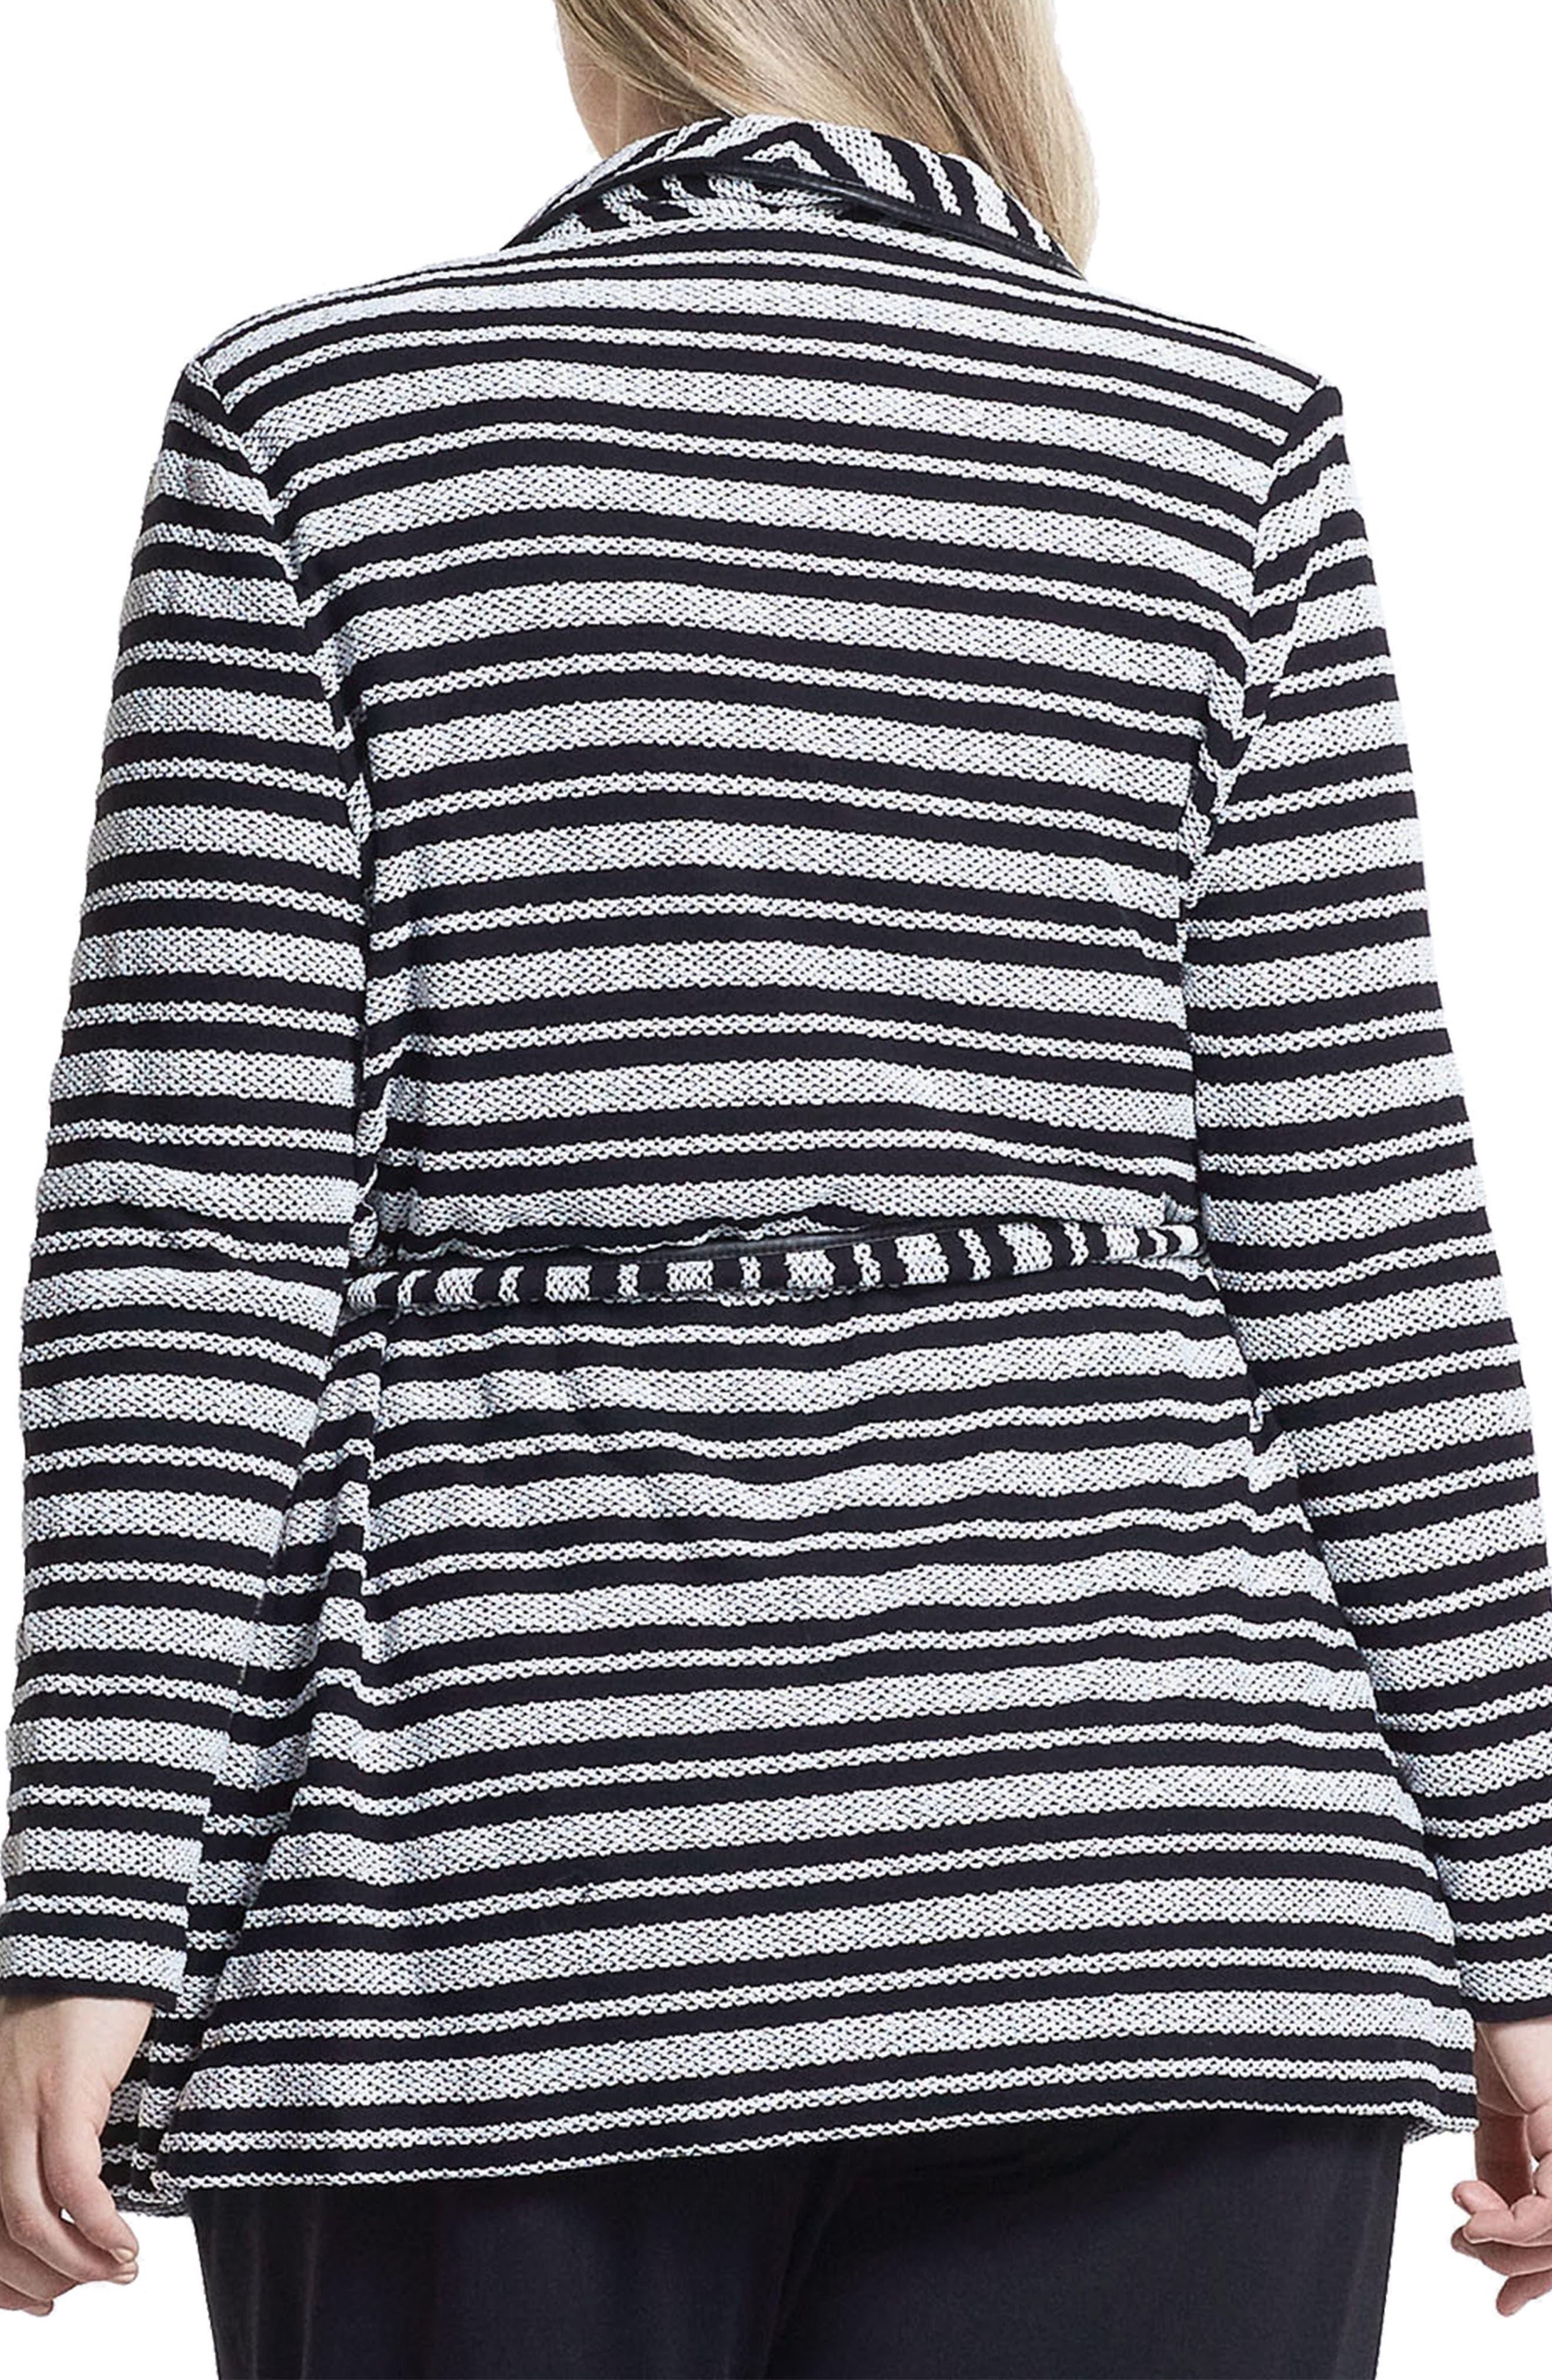 Xena Belted Stripe Knit Jacket,                             Alternate thumbnail 2, color,                             Black/ White Stripe